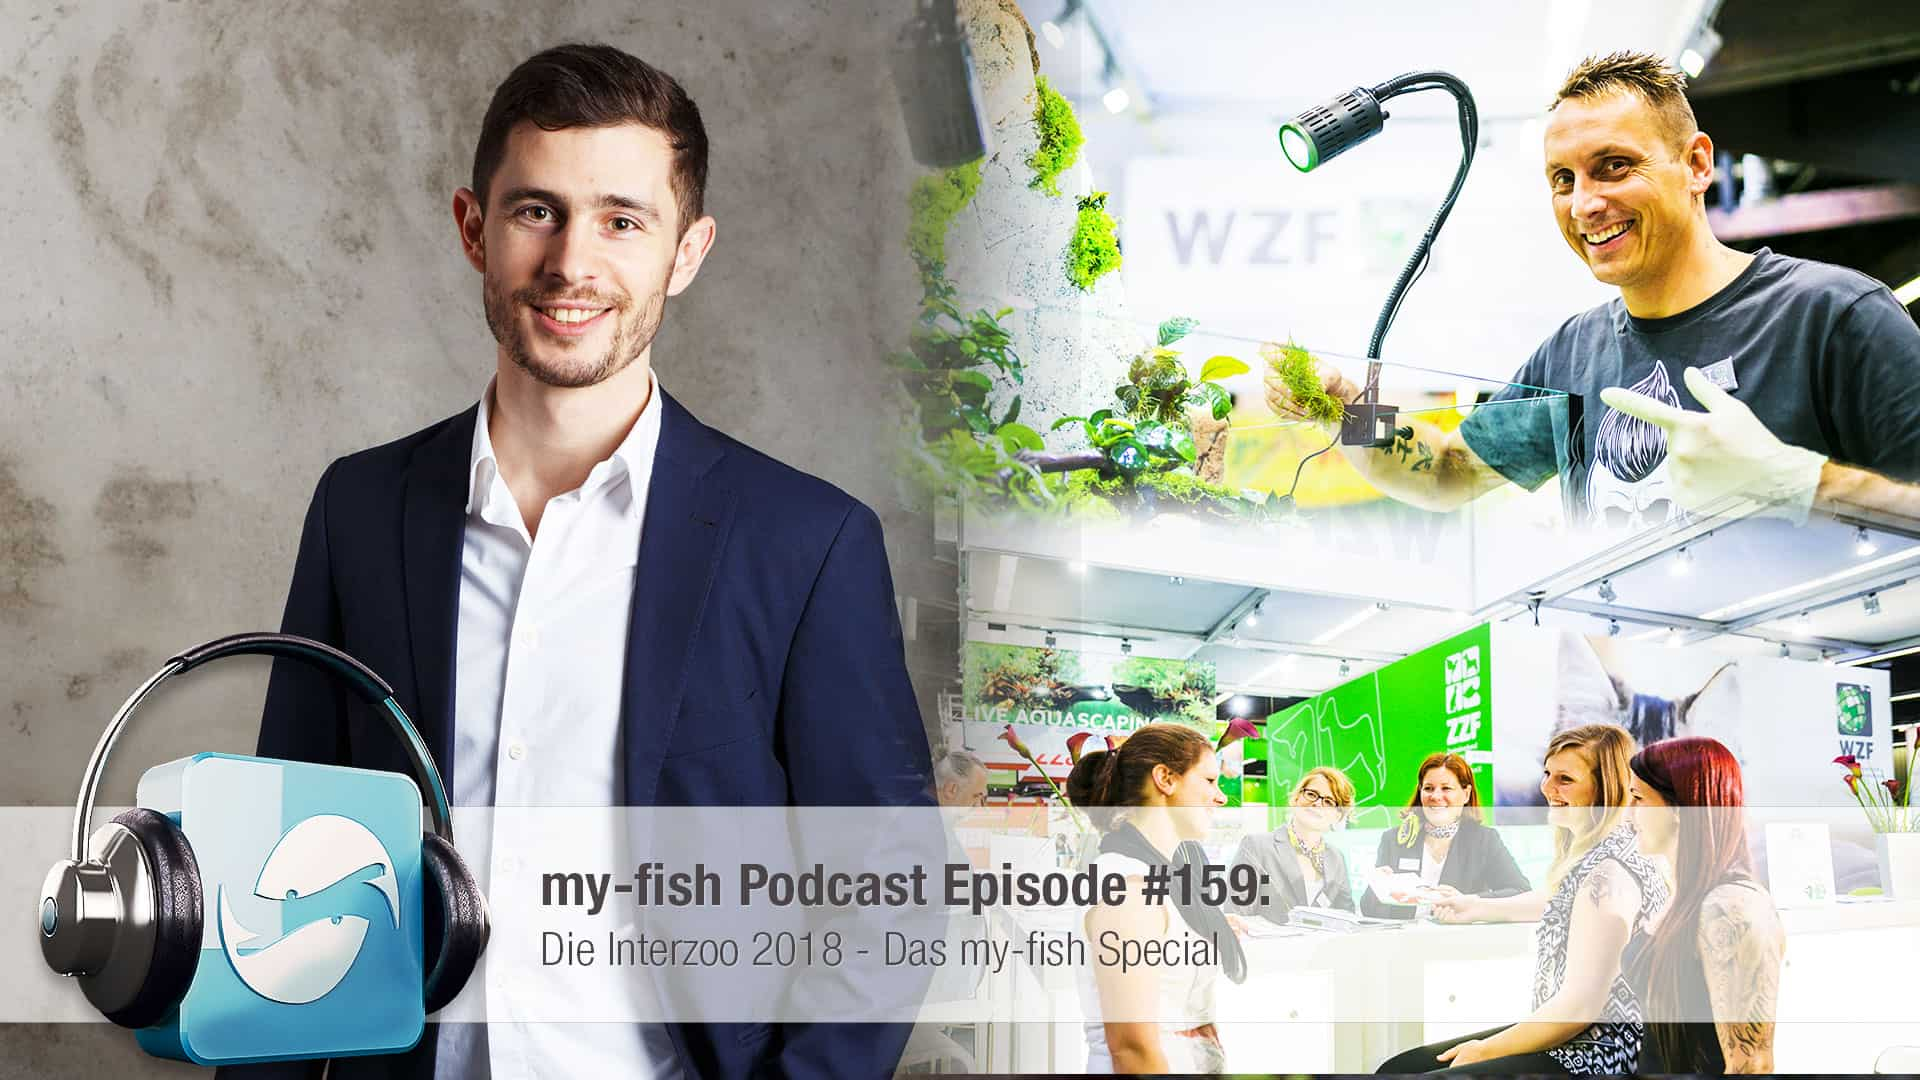 159 Die Interzoo 2018 - Das my-fish Special 1